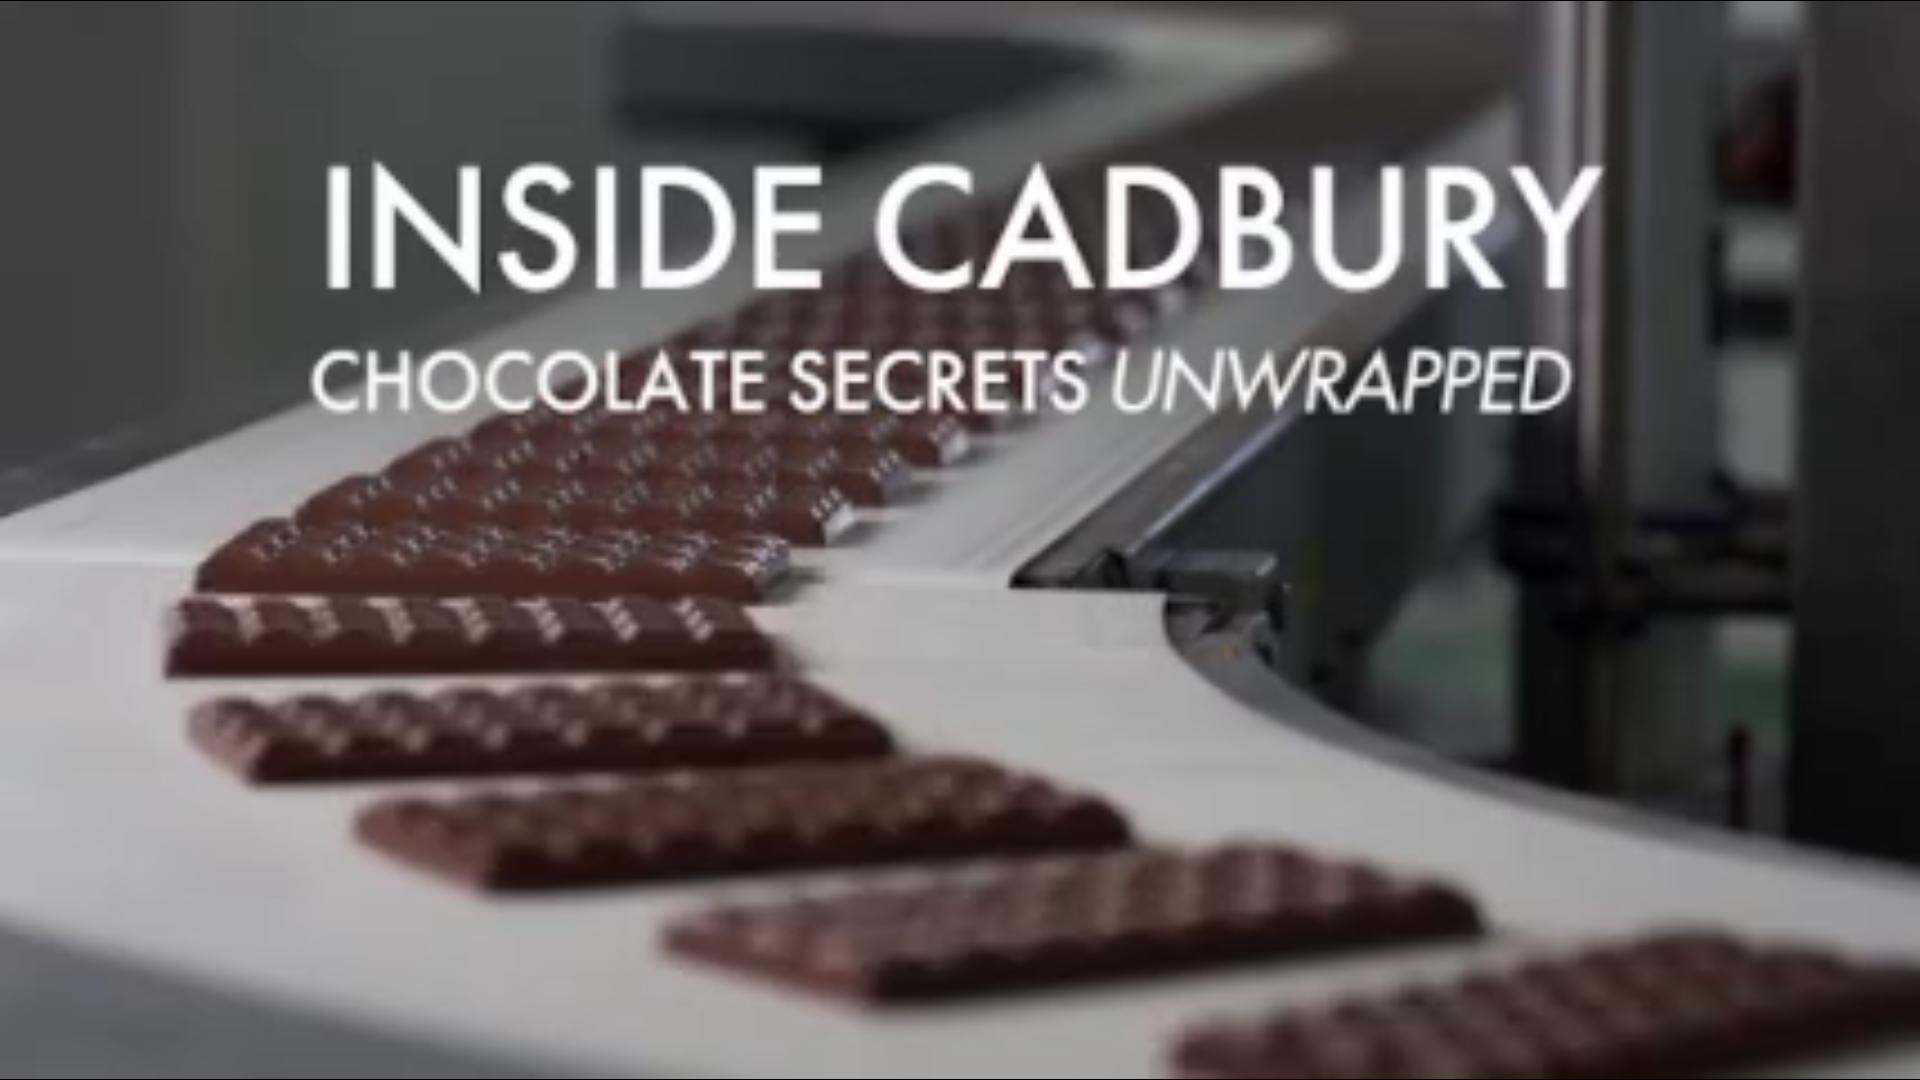 Inside Cadbury: Chocolate Secrets Unwrapped